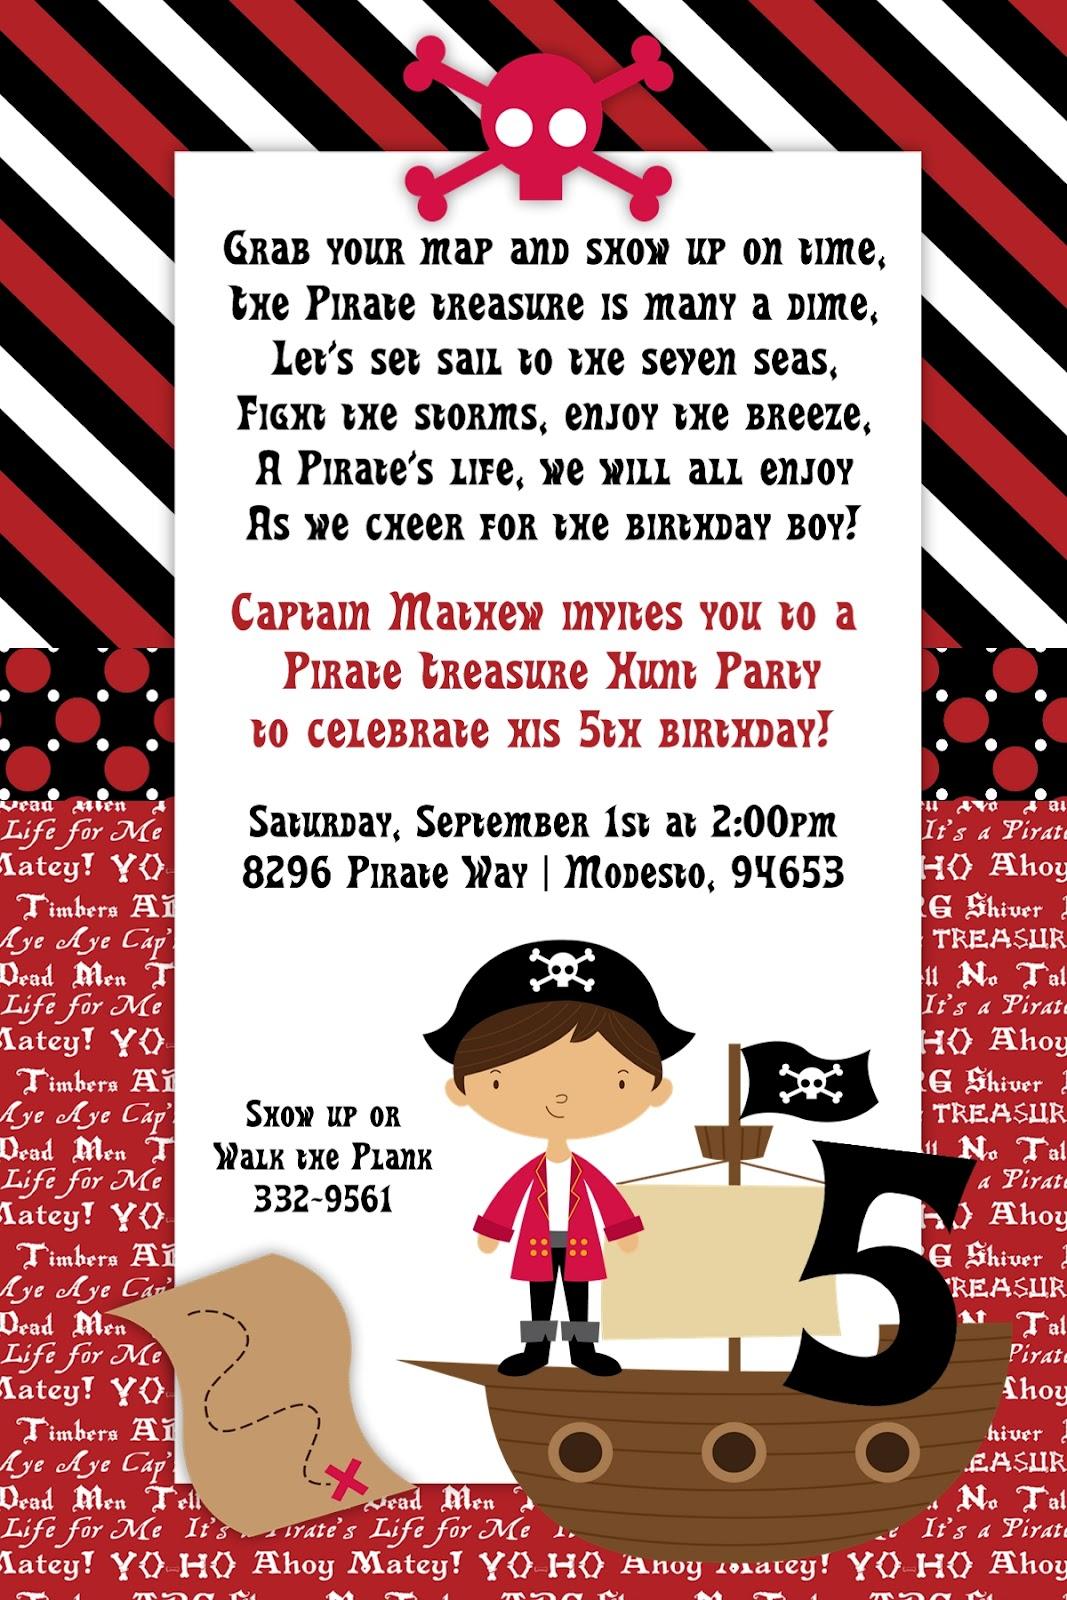 Pirate 4th birthday invitation wording pirate birthday party invitation wording filmwisefo